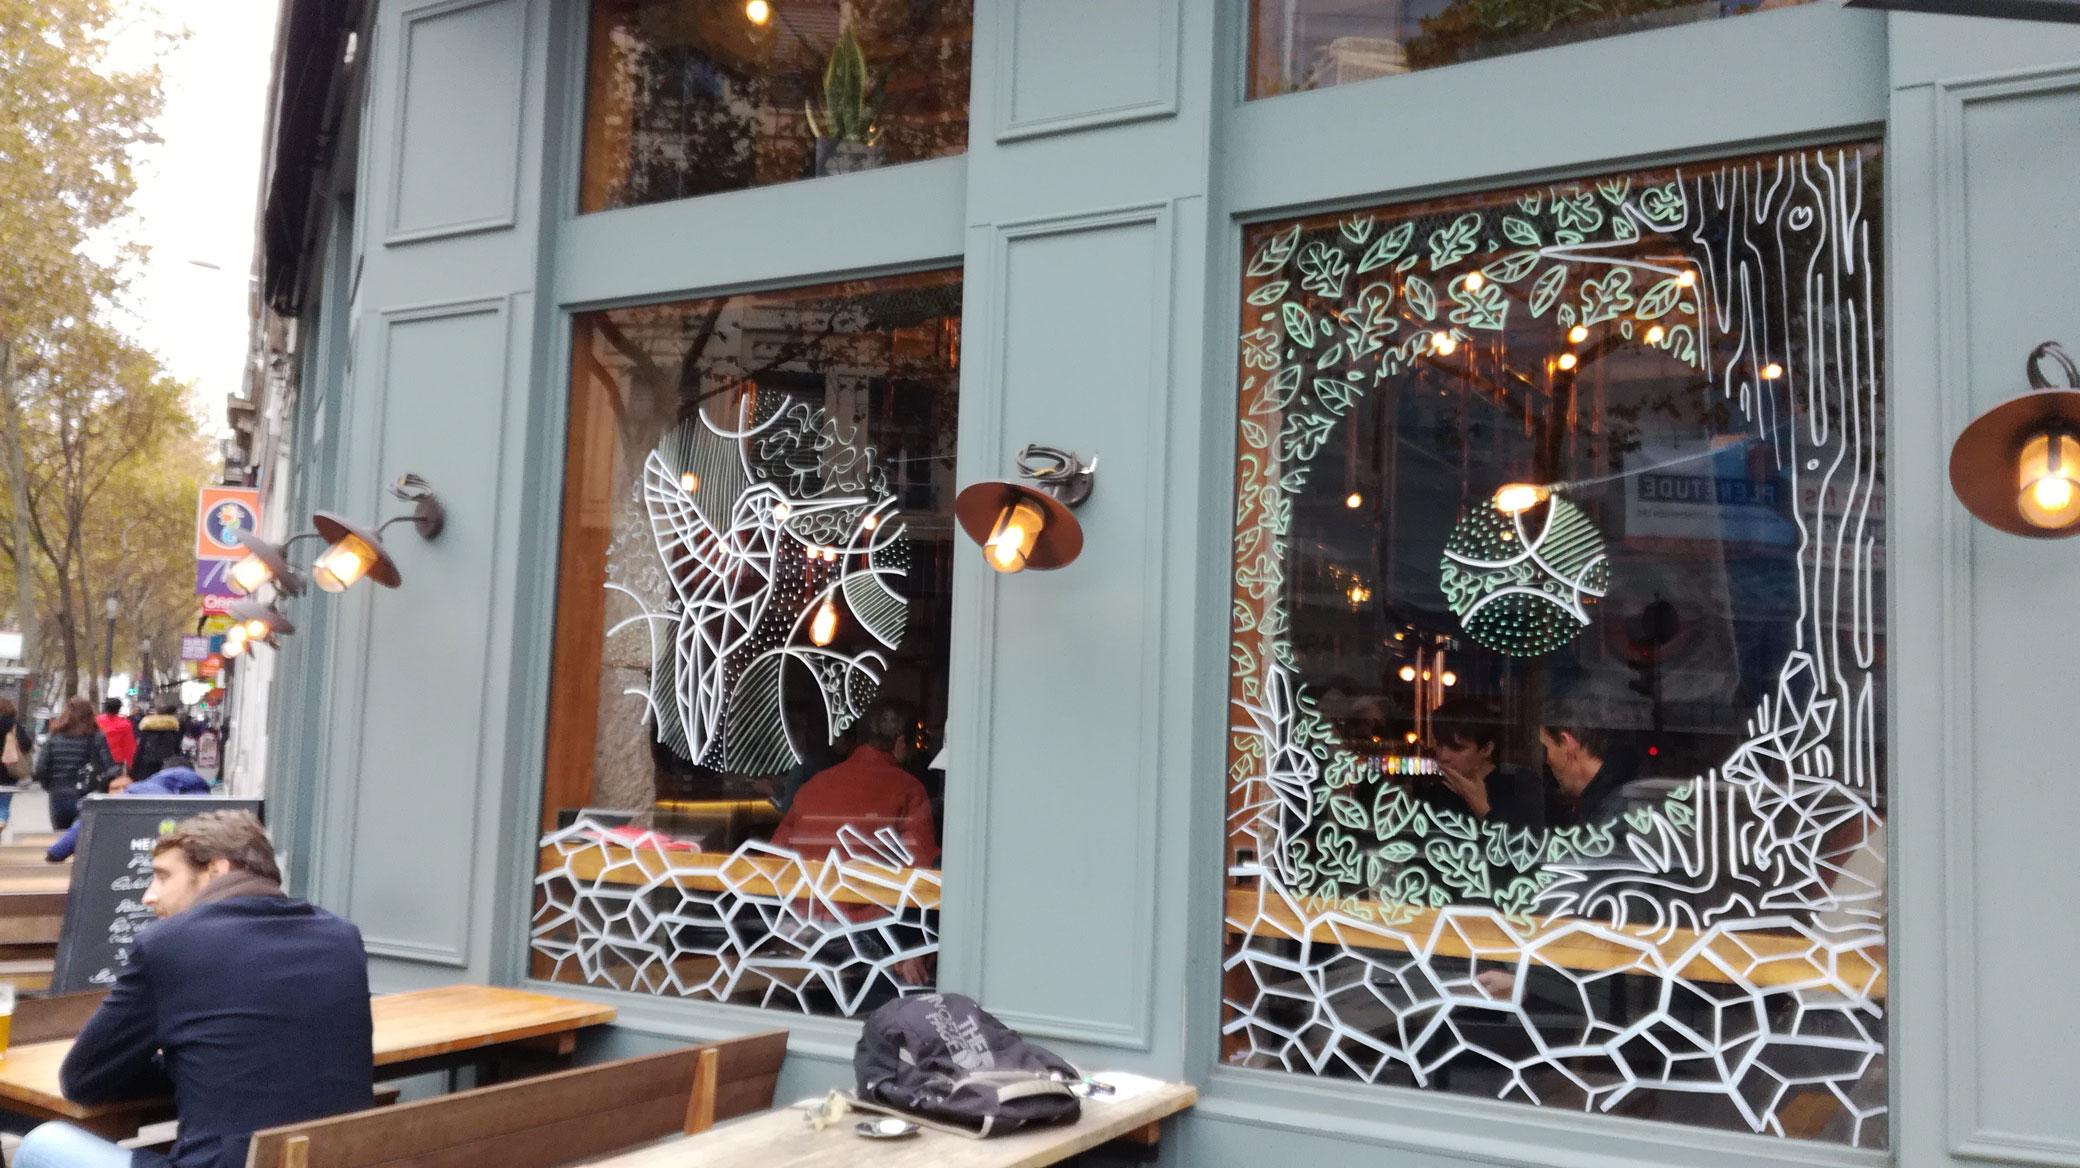 abys-illustration da streetart posca decoration vitrine hopper